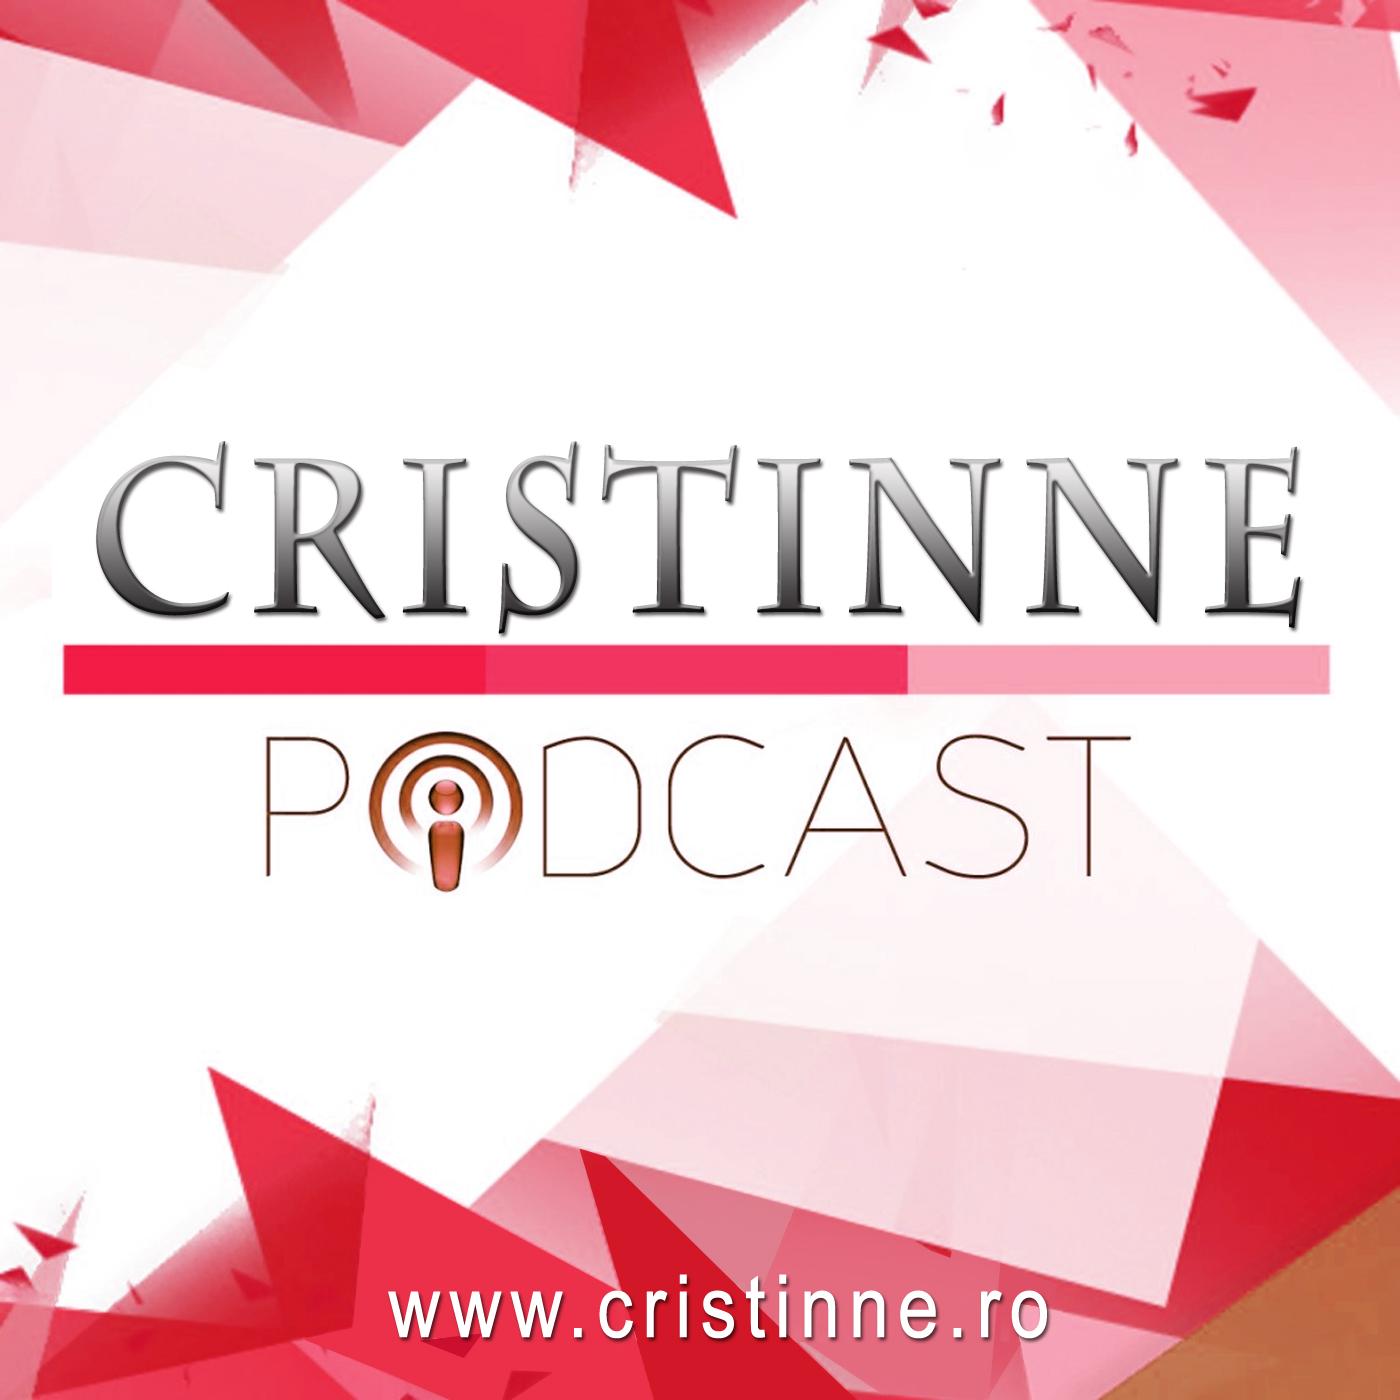 Cristinne Podcast | Afaceri online Marketing Dezvoltare personala